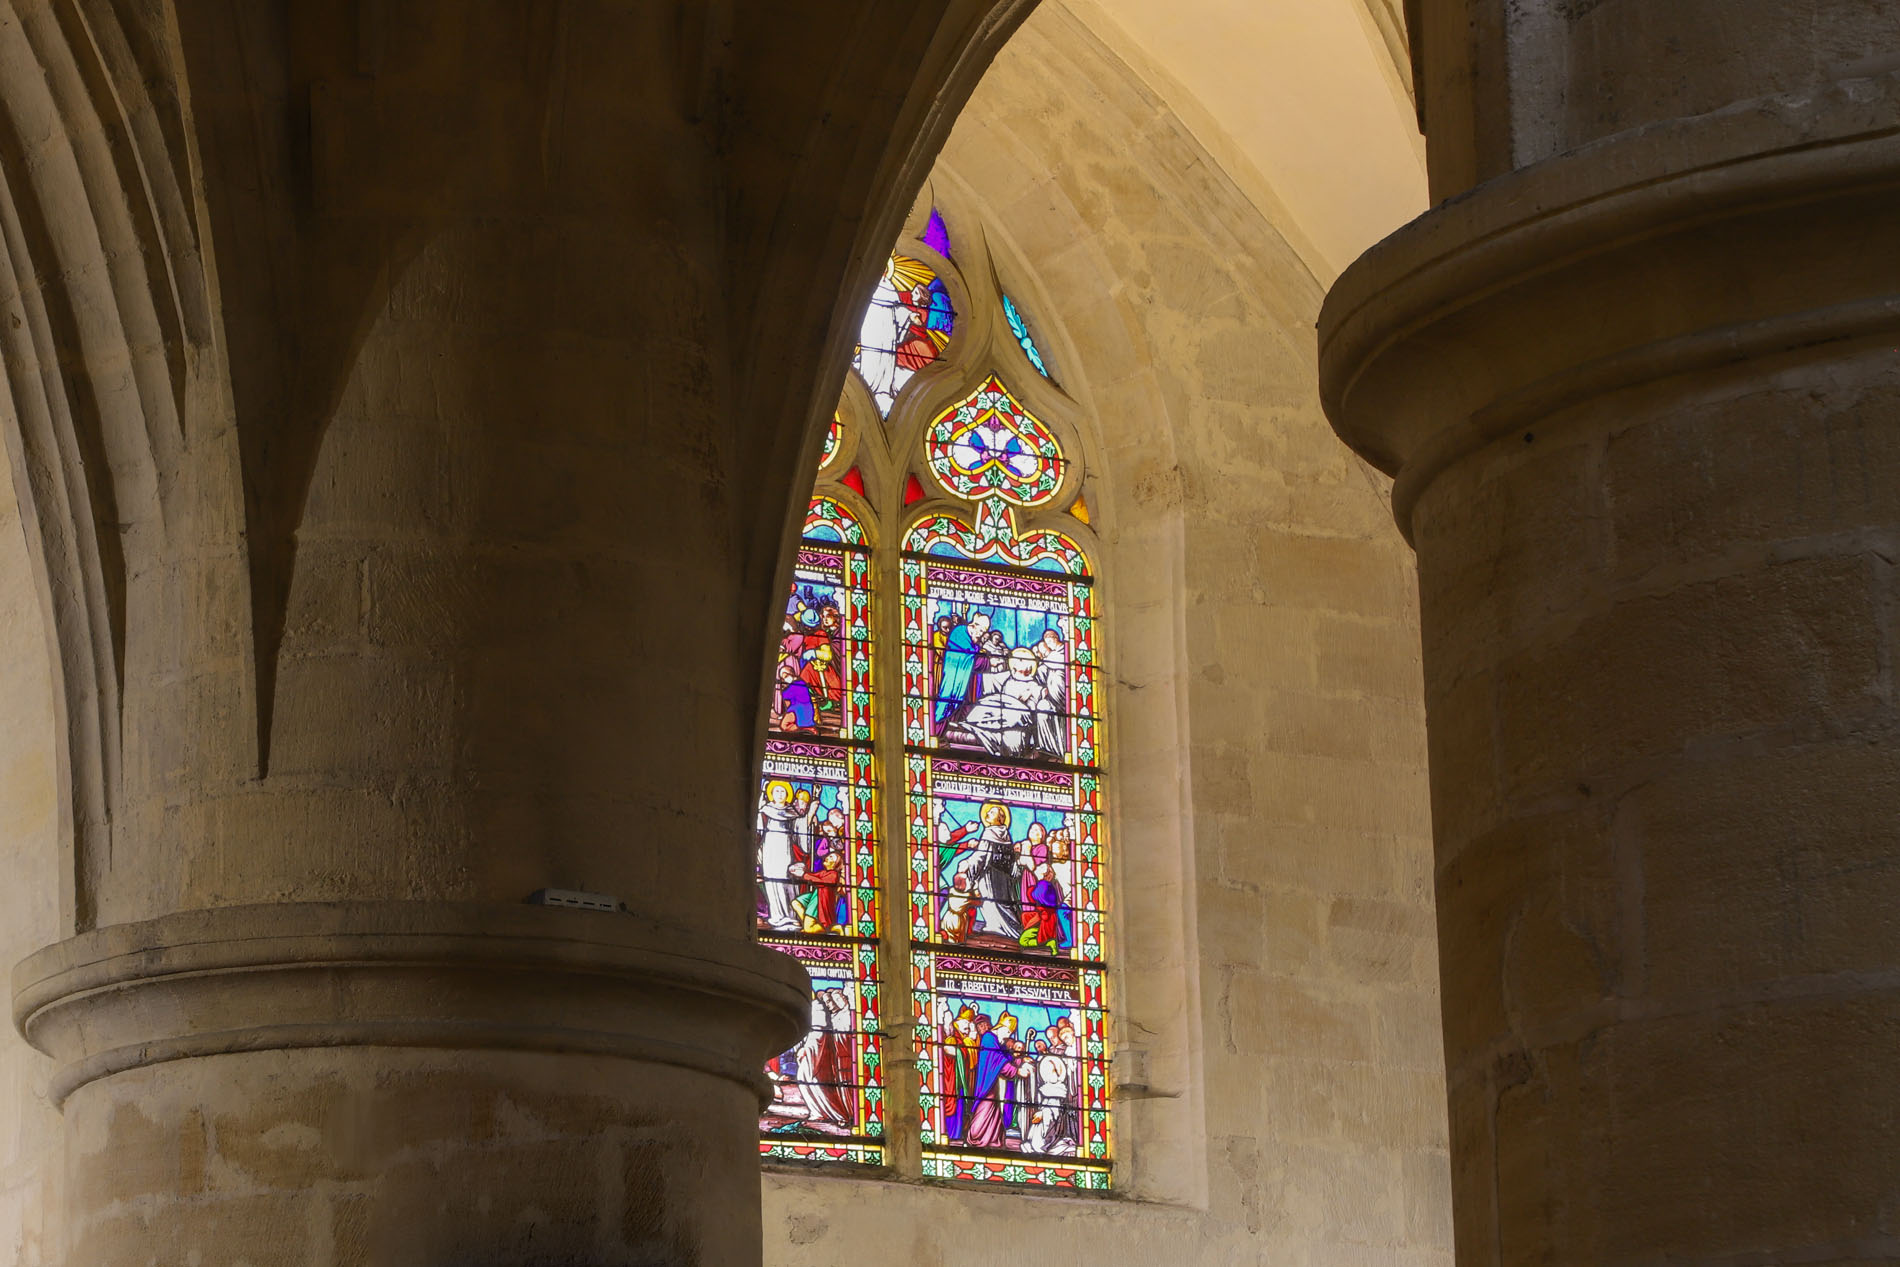 vitraux-cathedrale-saint-sacerdos